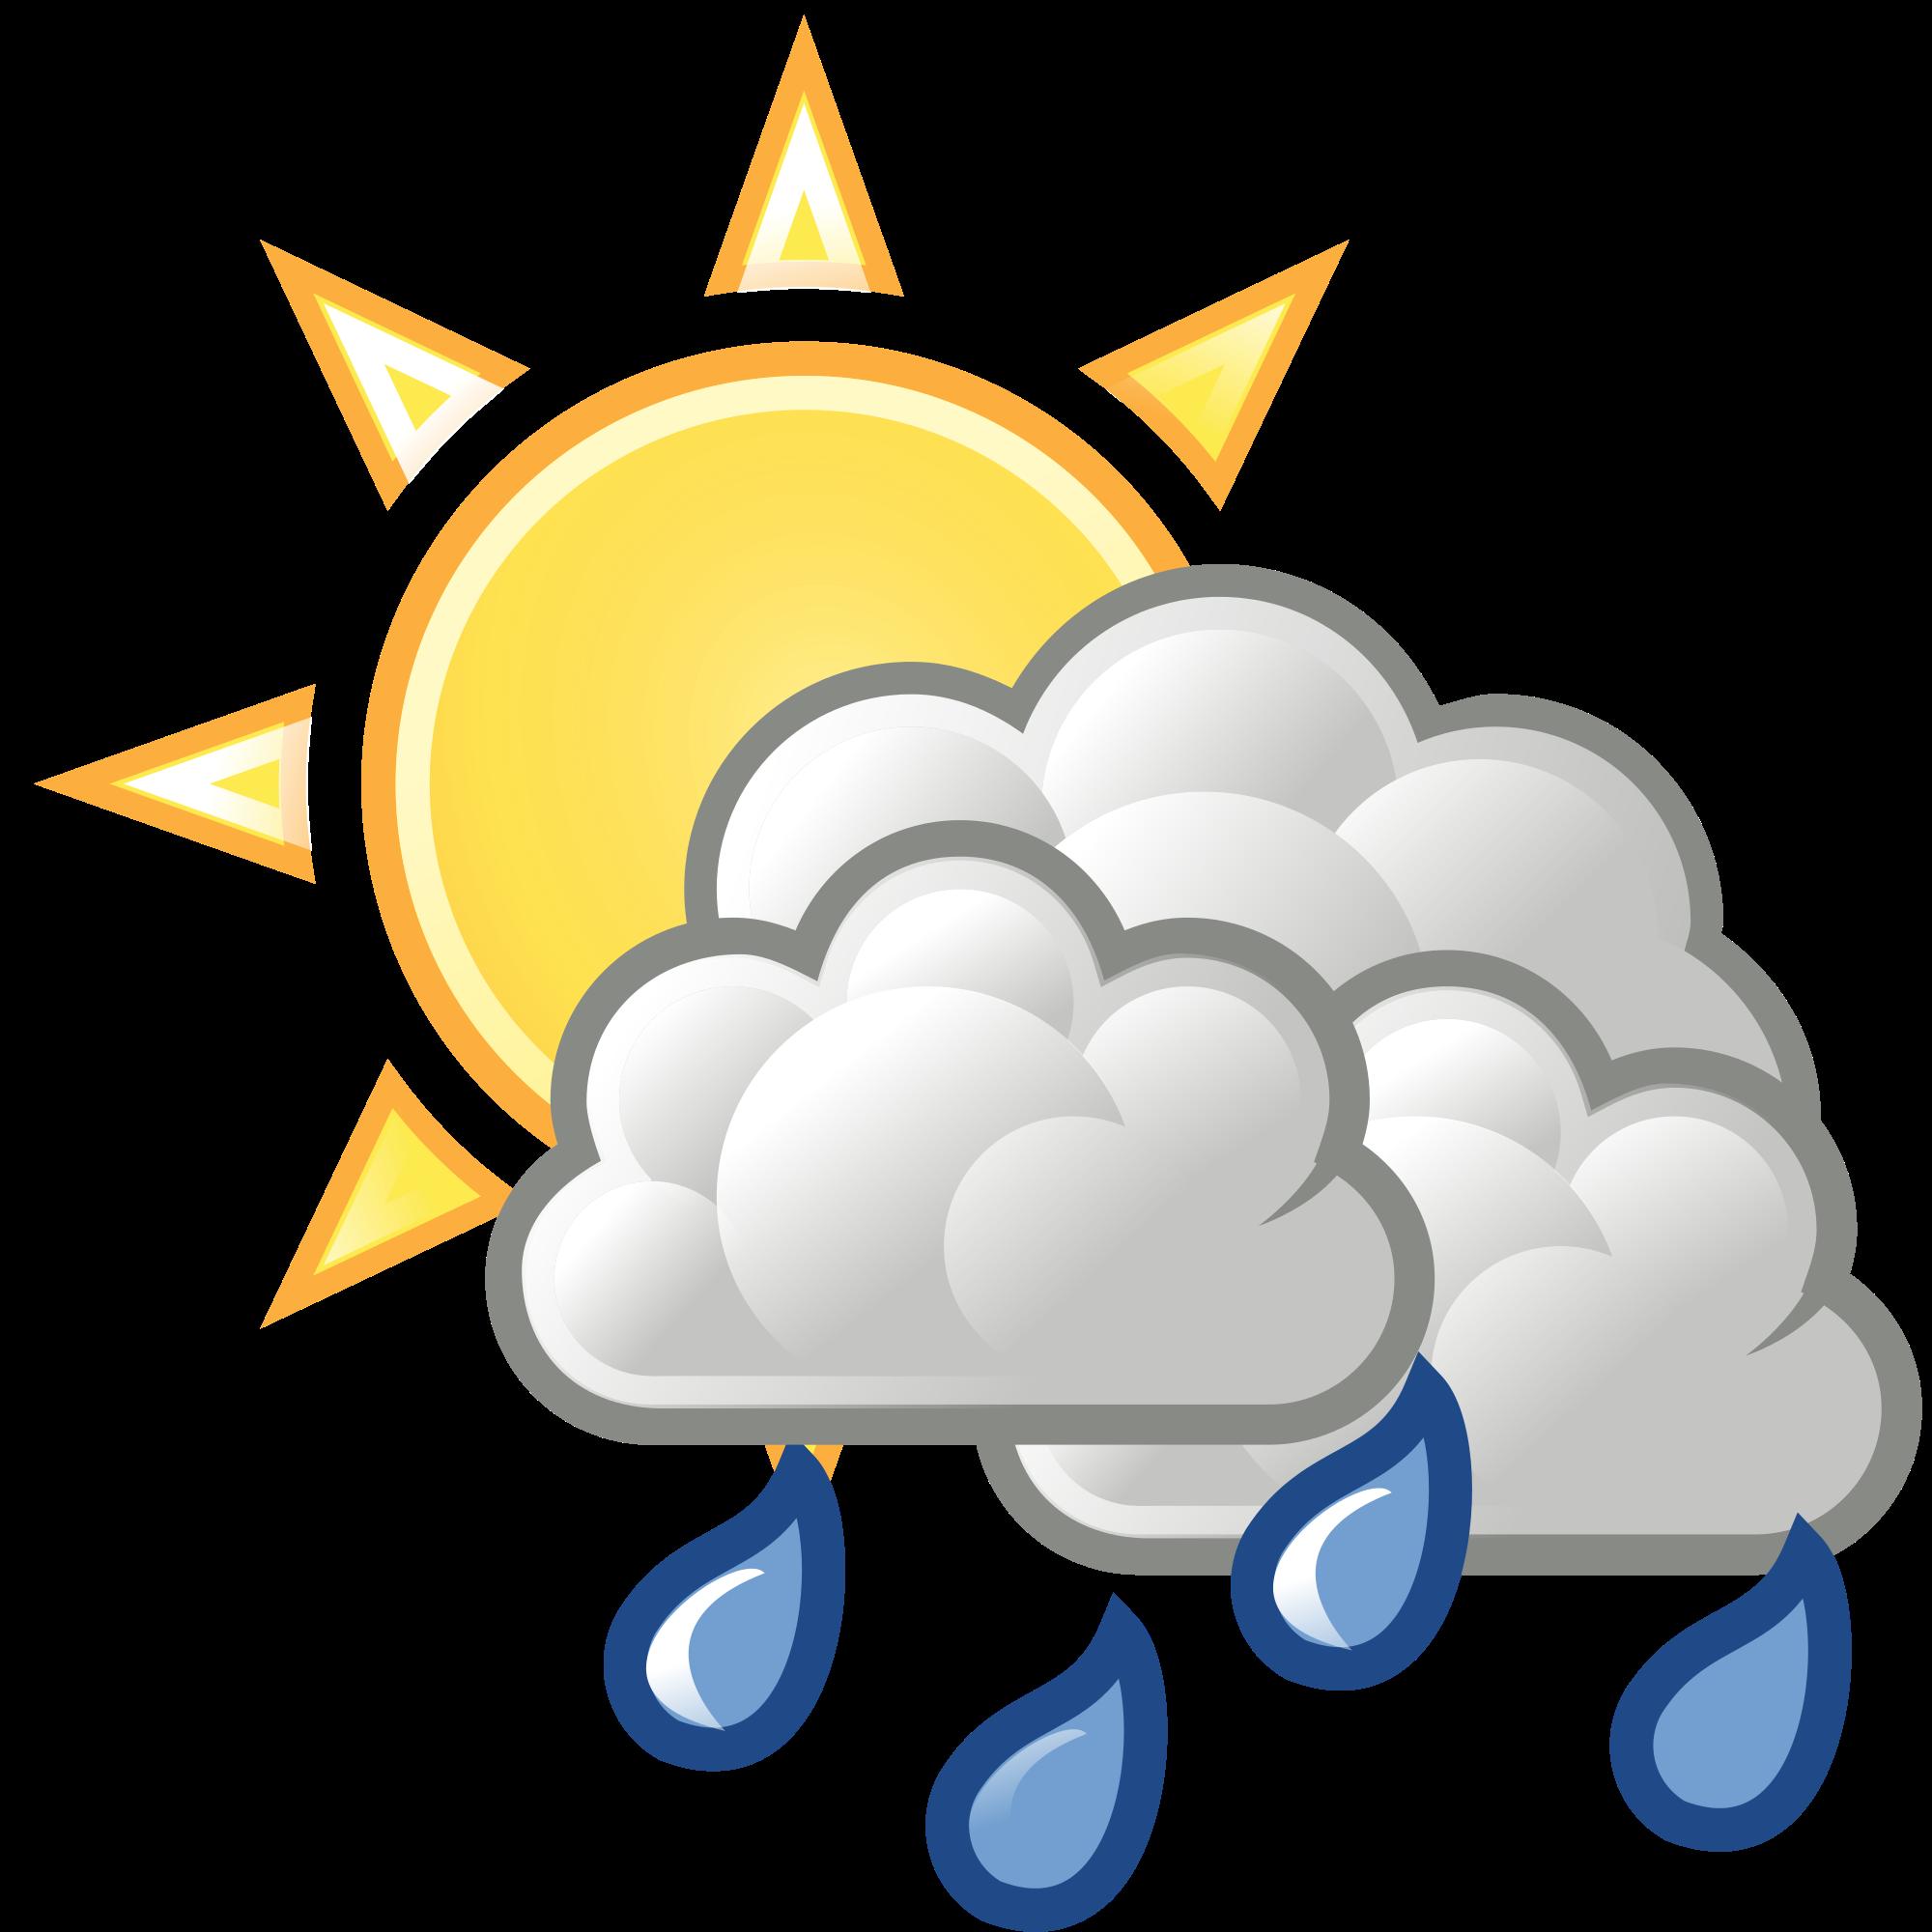 Open PlusPng.com  - Rain And Sun PNG